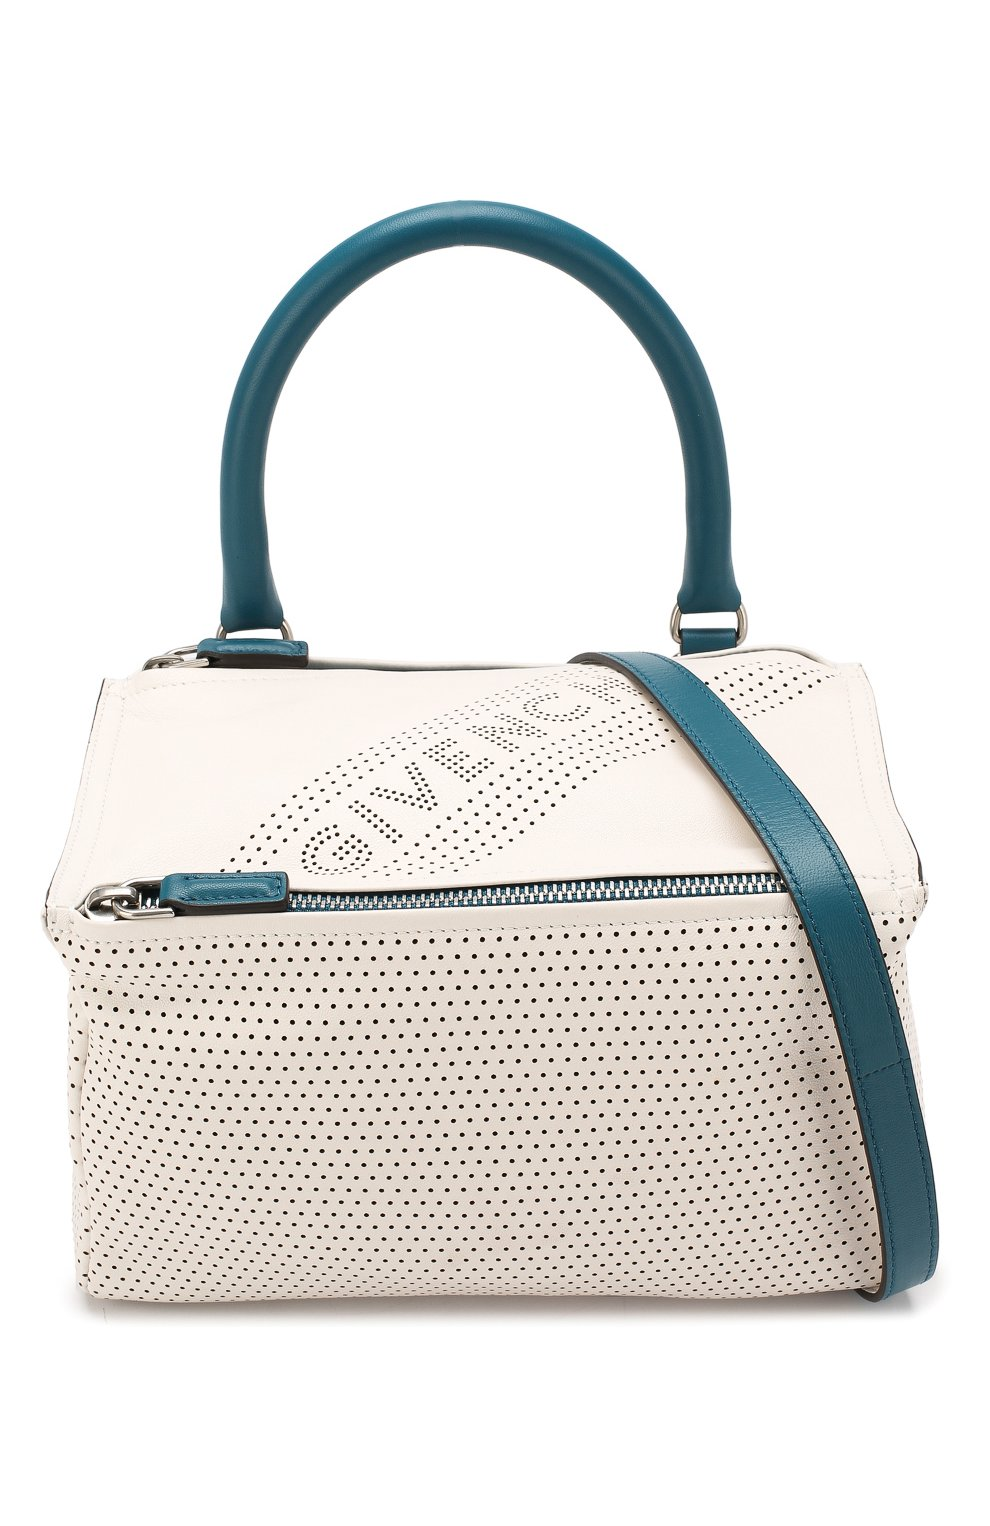 Кожаная сумка Pandora small Givenchy белая цвета | Фото №6